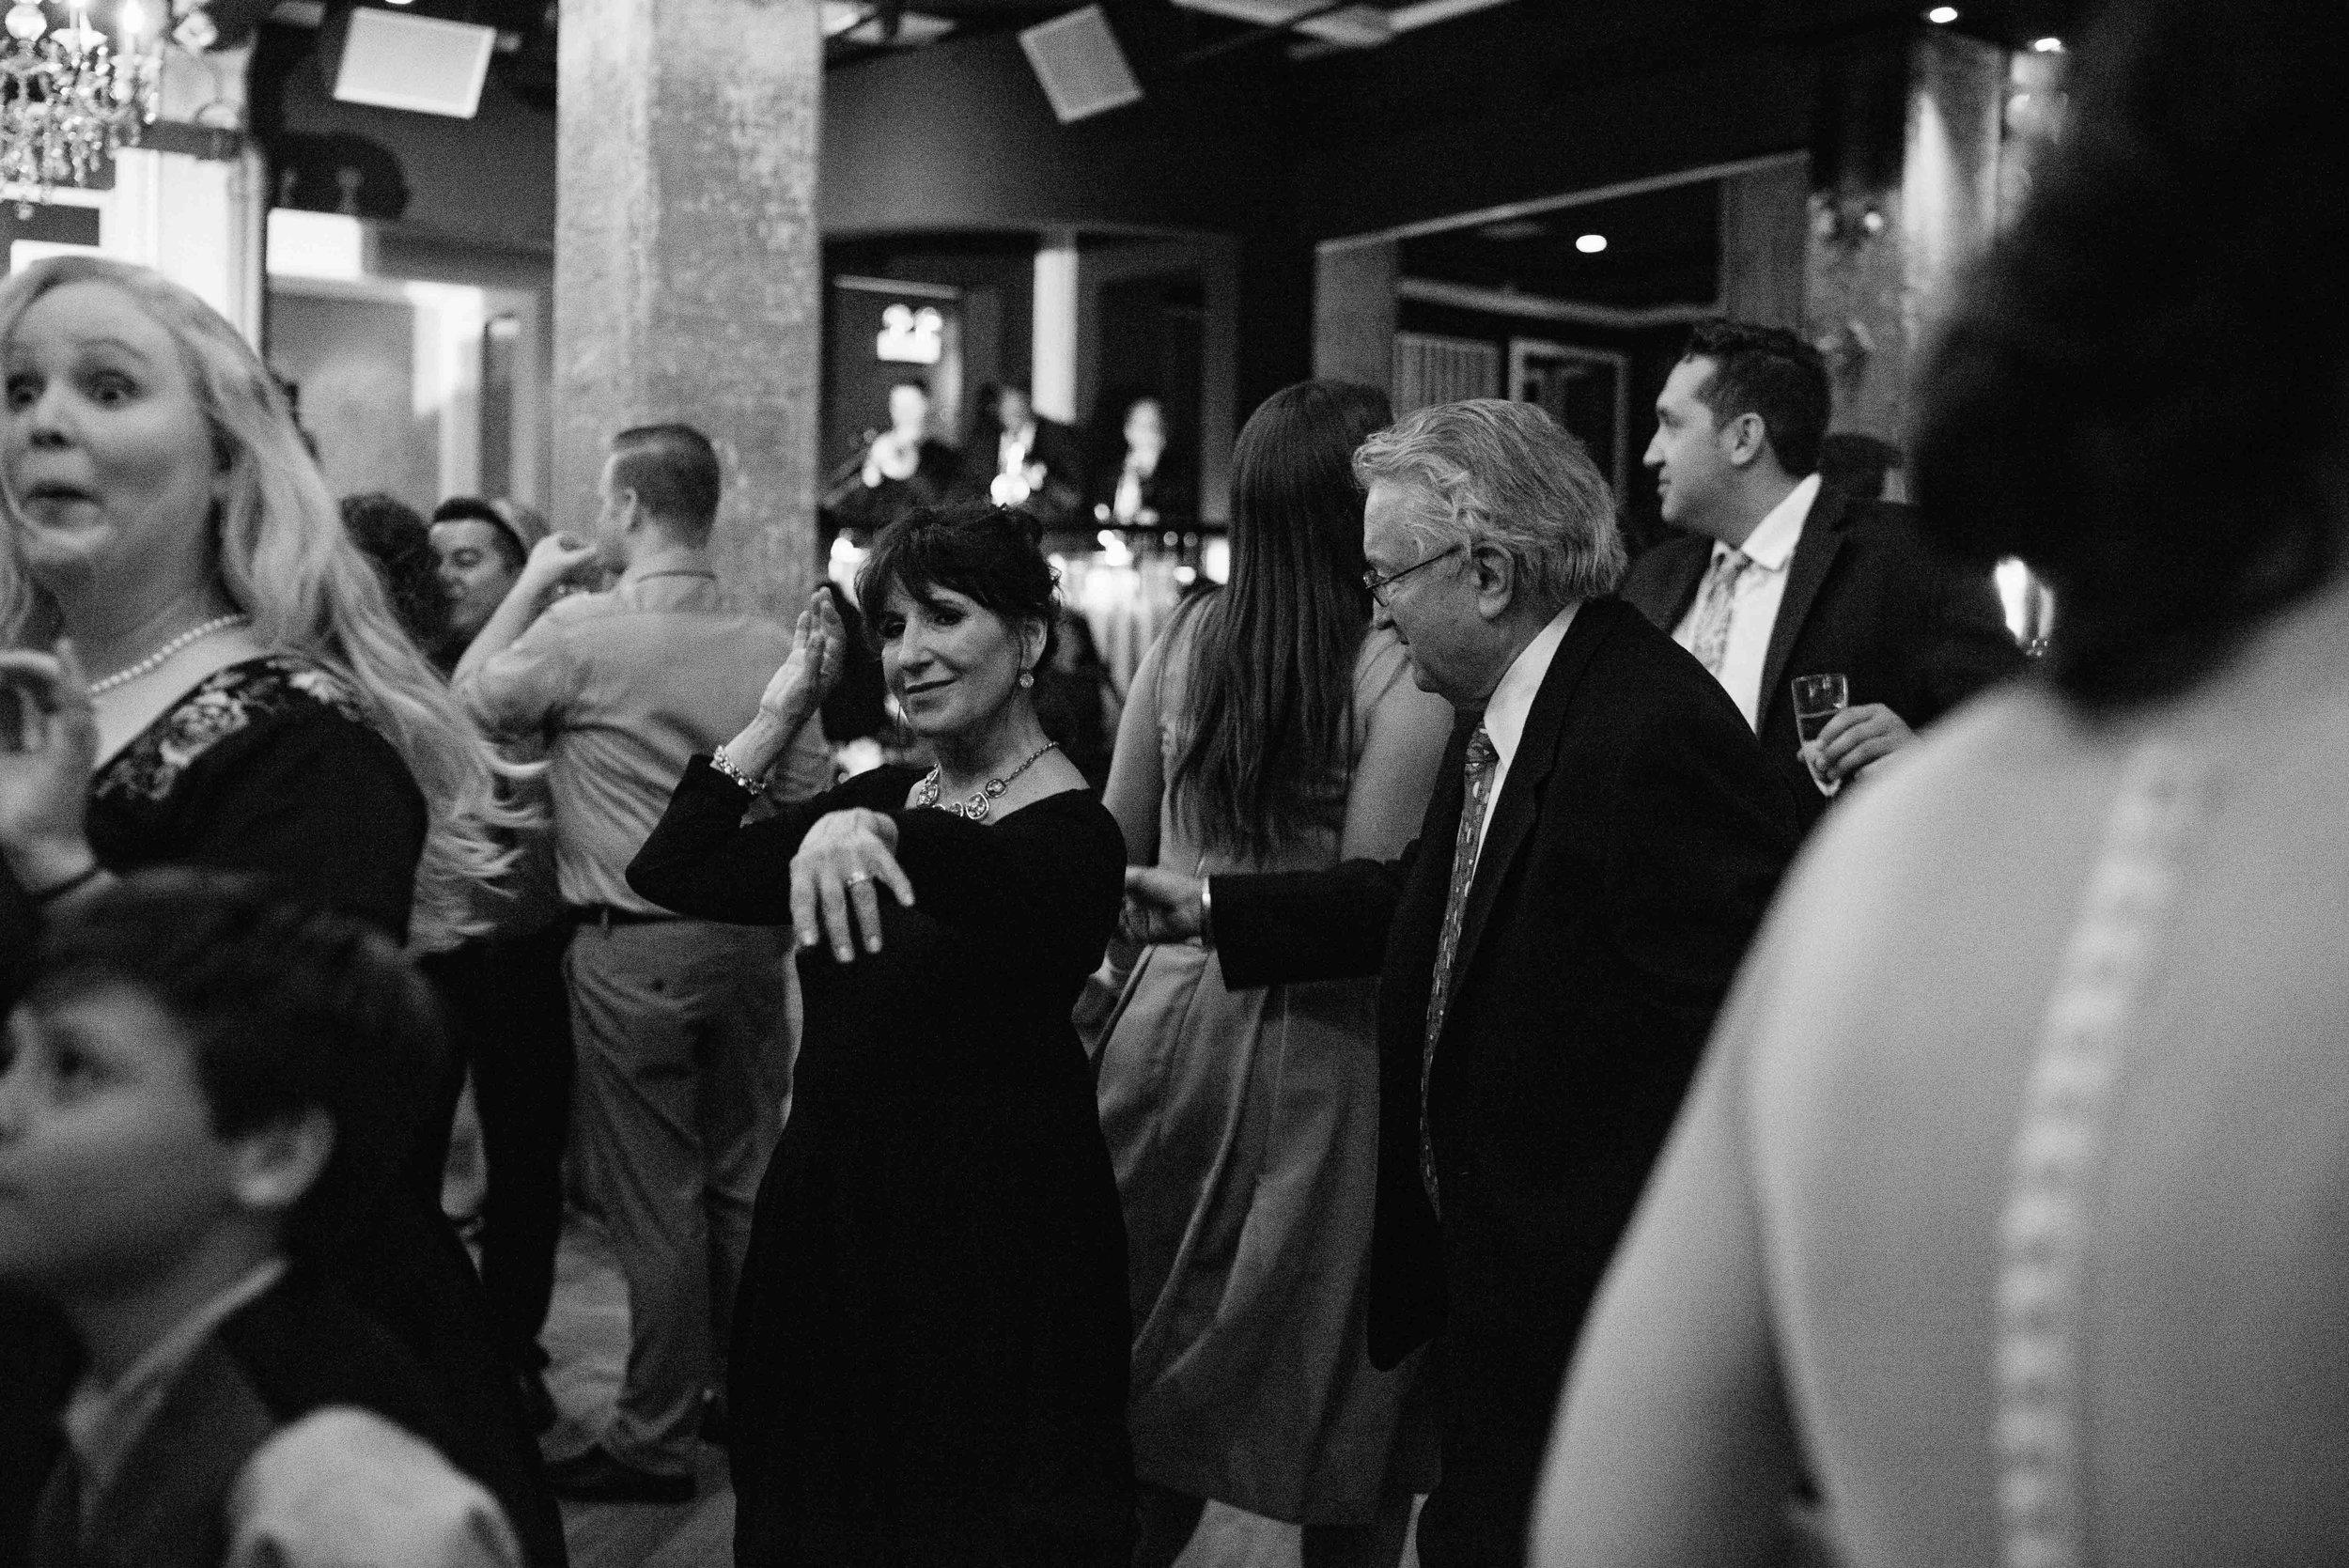 Patricia-Steve-Blog-Indianapolis-Wedding-136.jpg